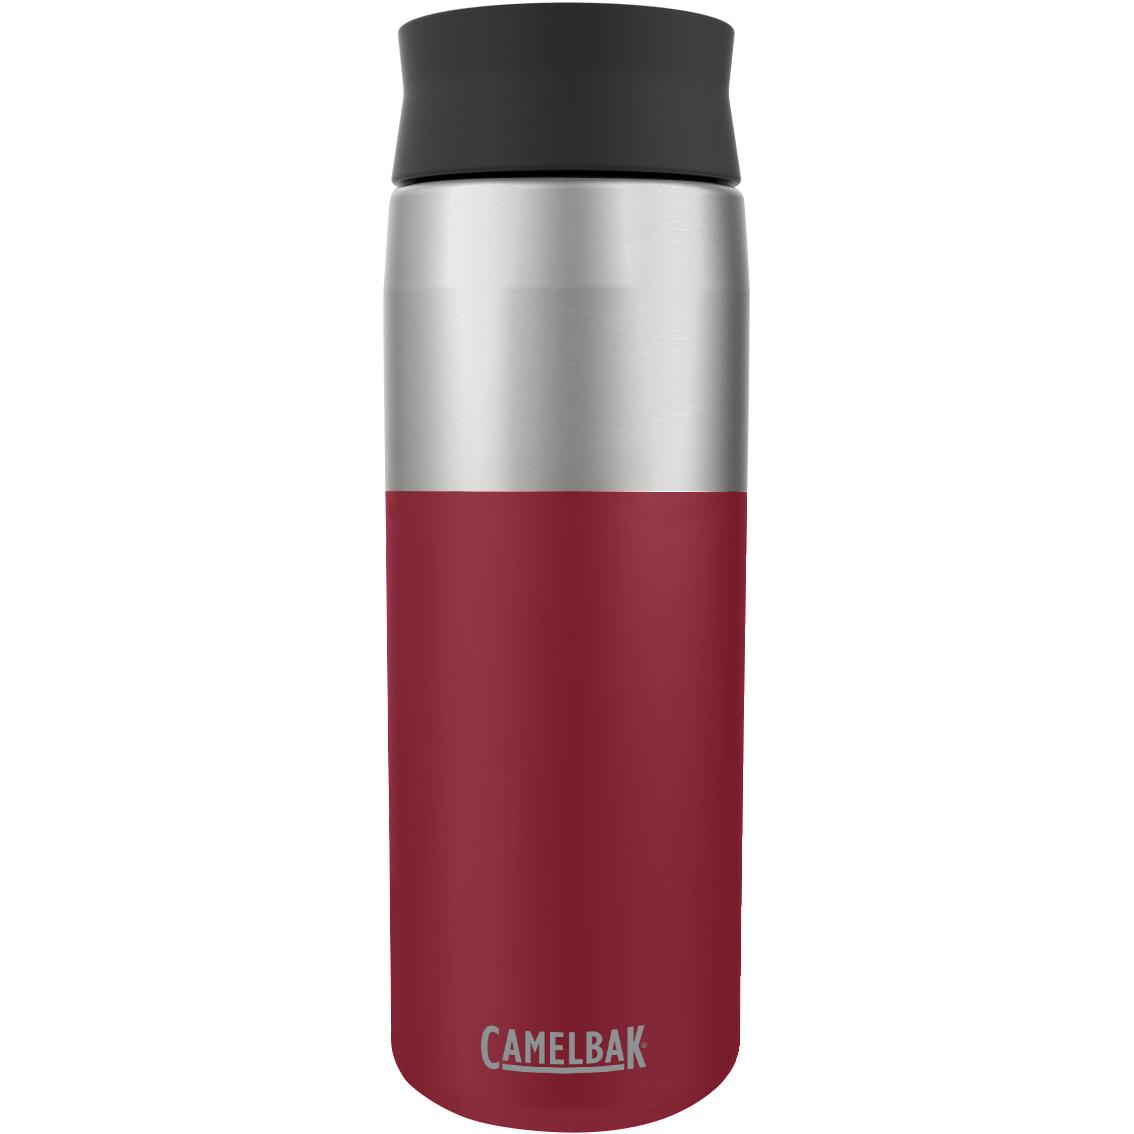 Camelbak HOT CAP VAC. 0,6L, steklenica, rdeča